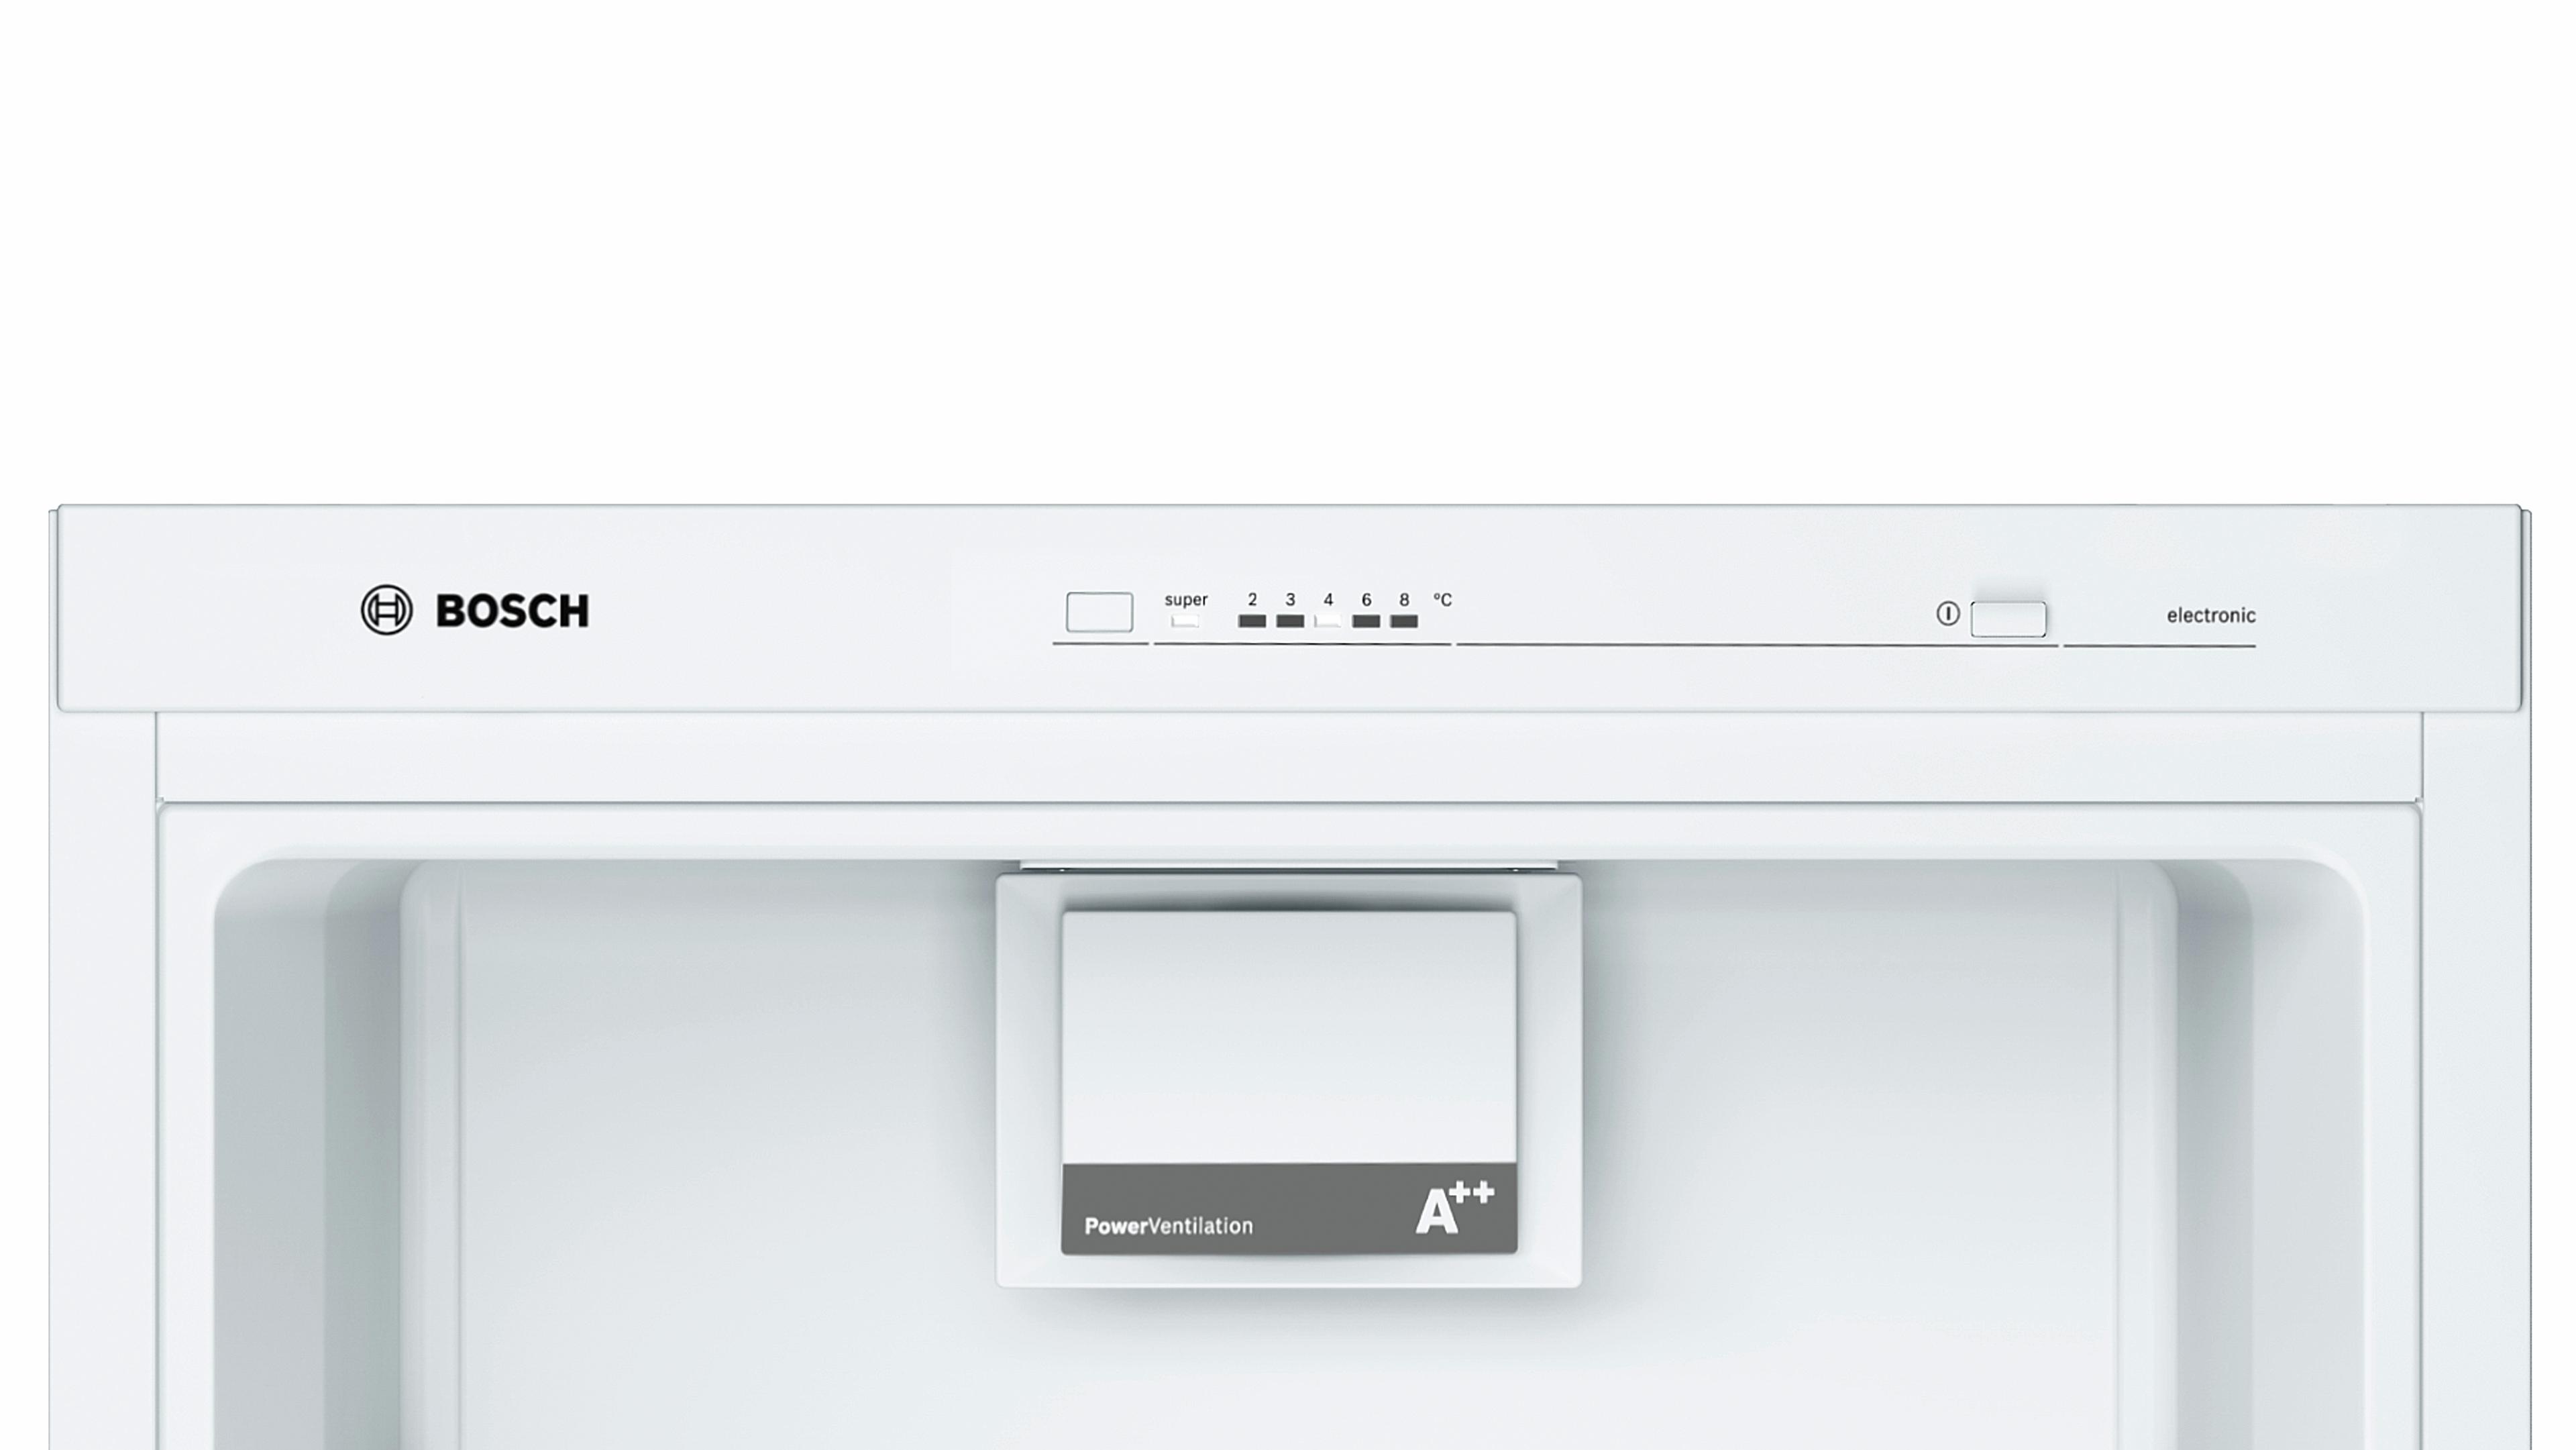 Bosch Kühlschrank Super : Kühlschrank bosch ksv29nw3p küche&co